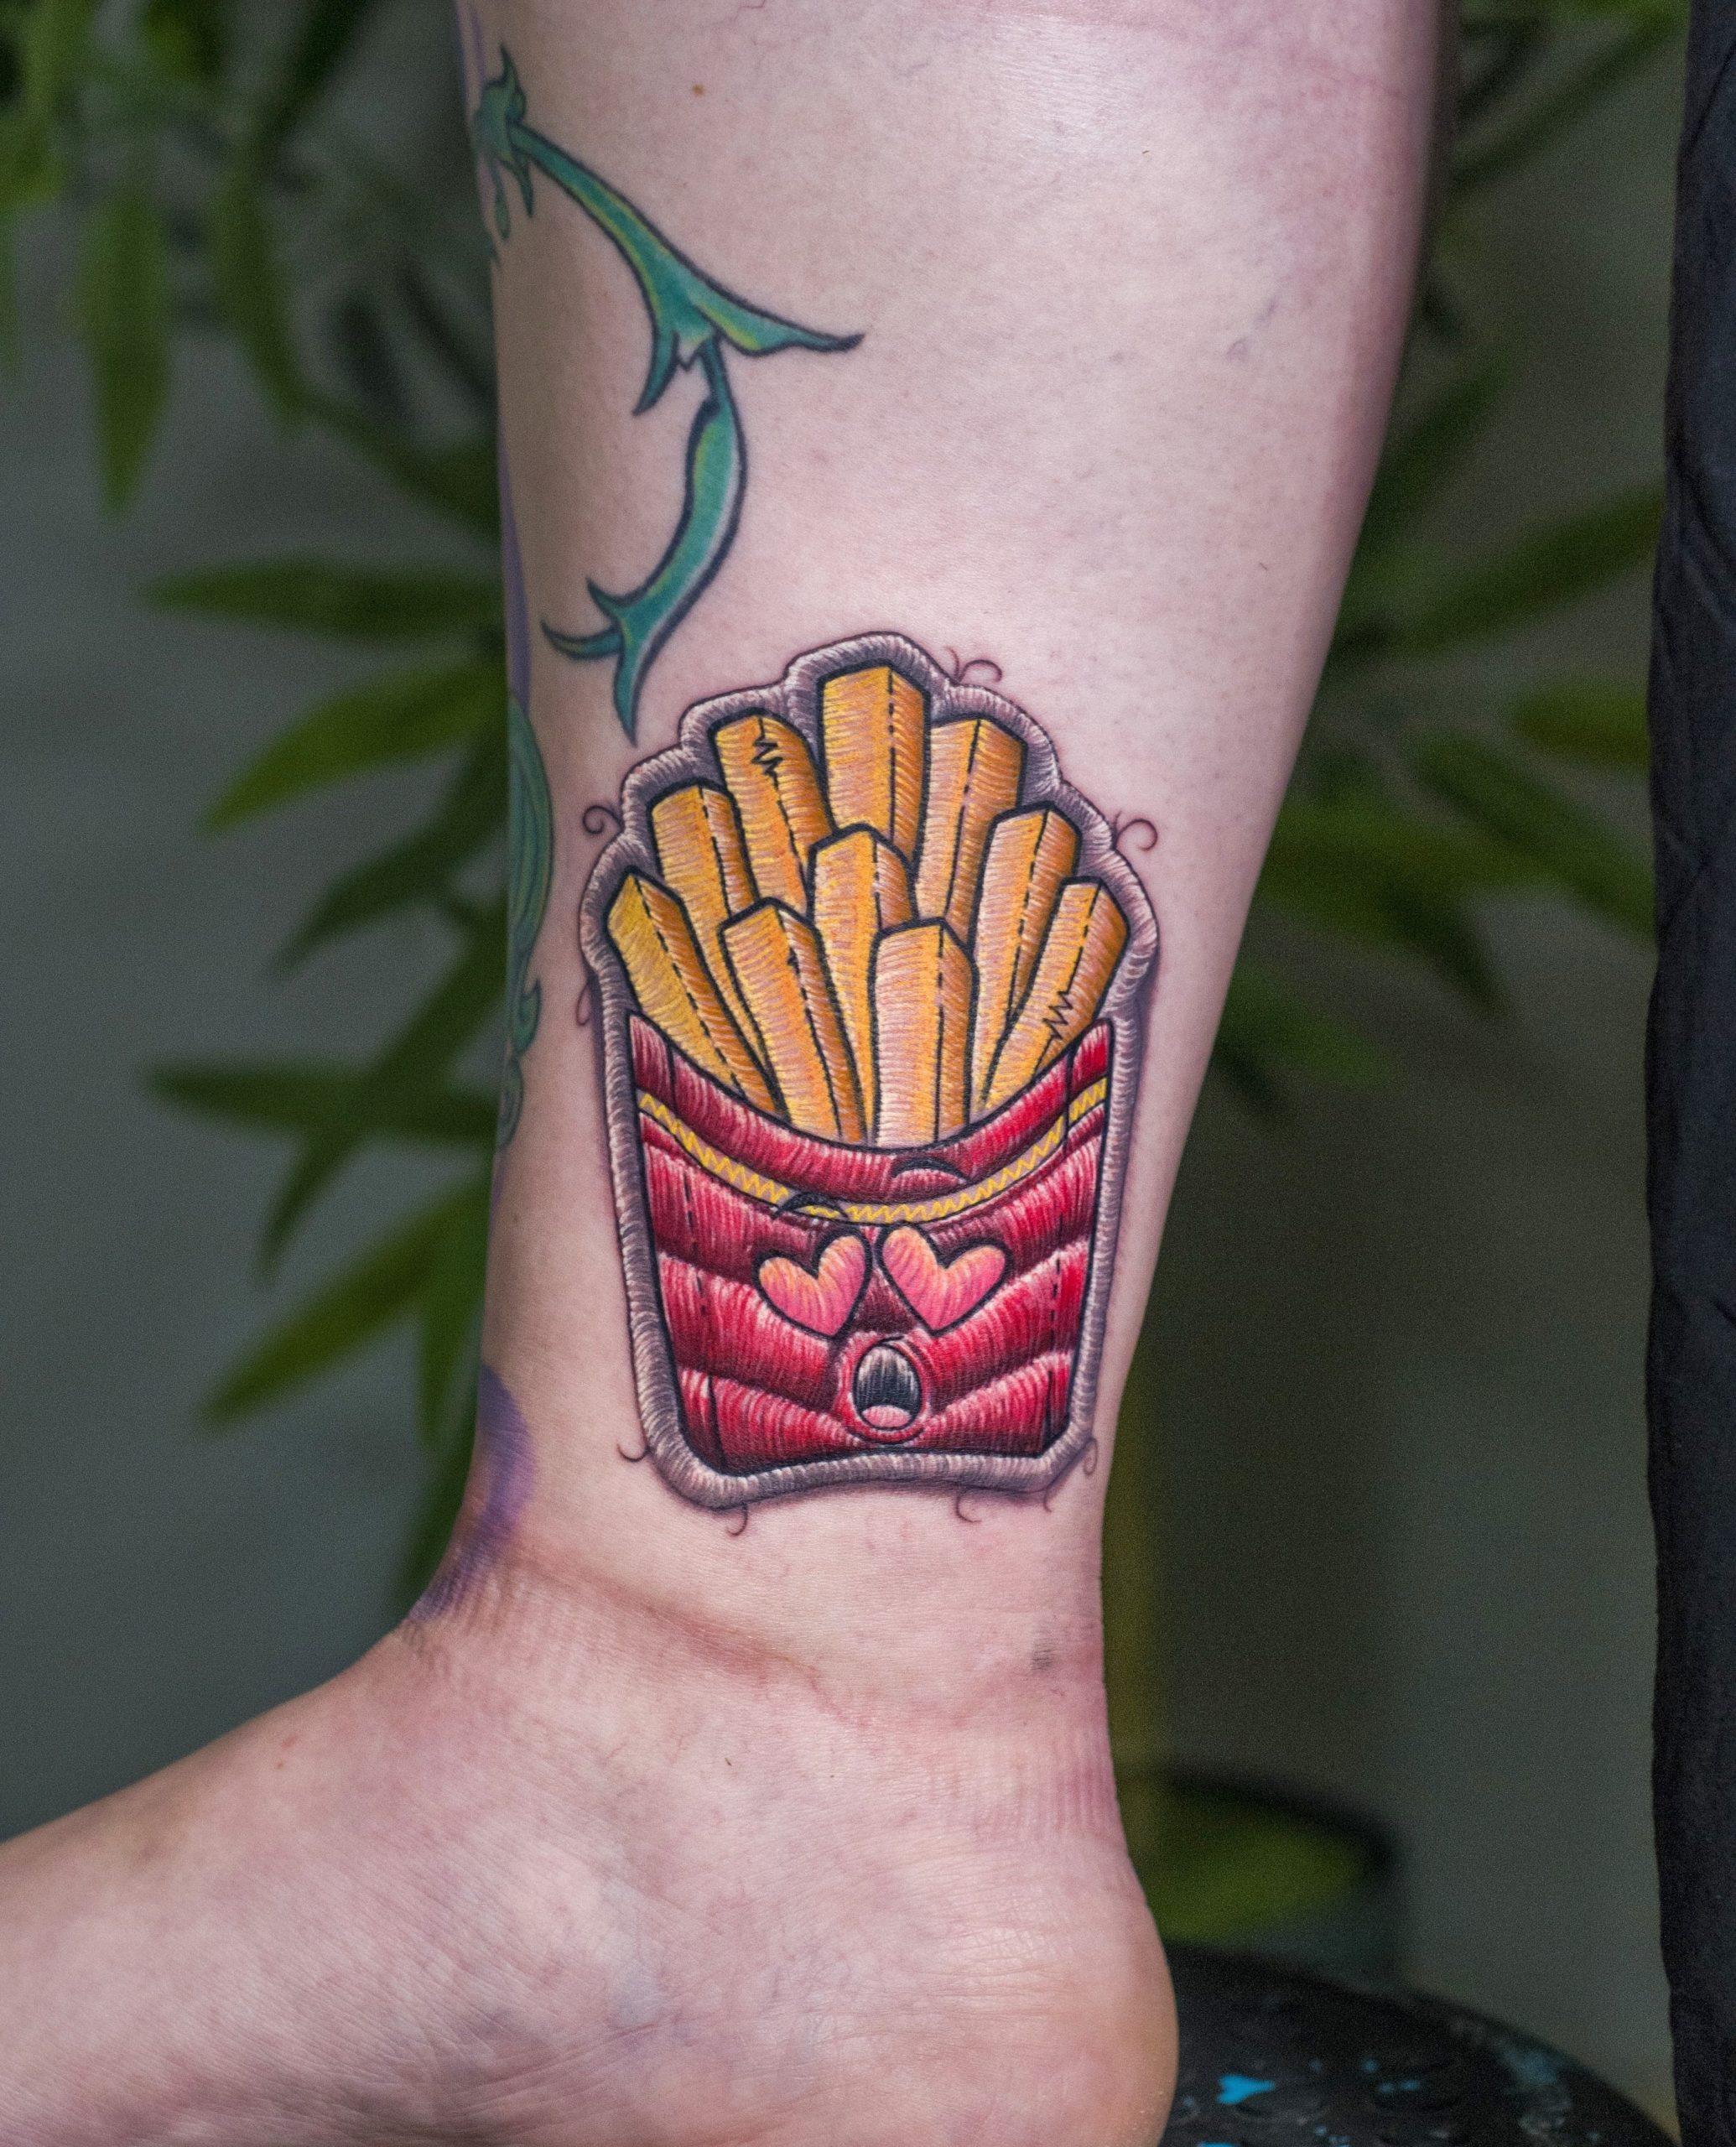 FRENCH FRIES EMBROIDERY PATCH tattoo color קעקוע צ'יפס בסגנון פאצ' ריקמה טבעוני עיצוב מקורי